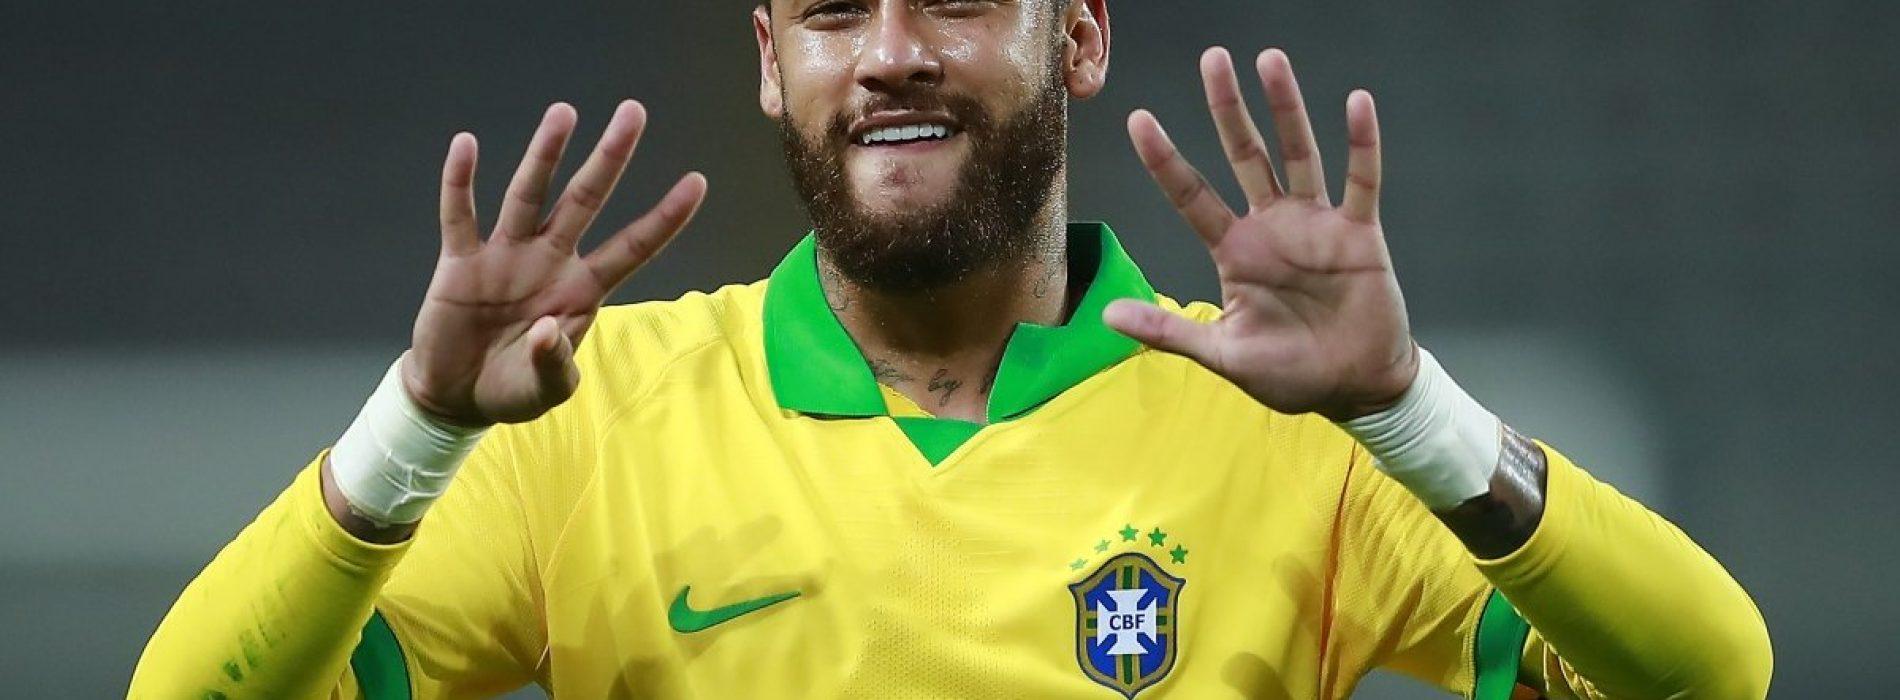 Brasile, record Neymar e saluto a Ronaldo contro il Perù